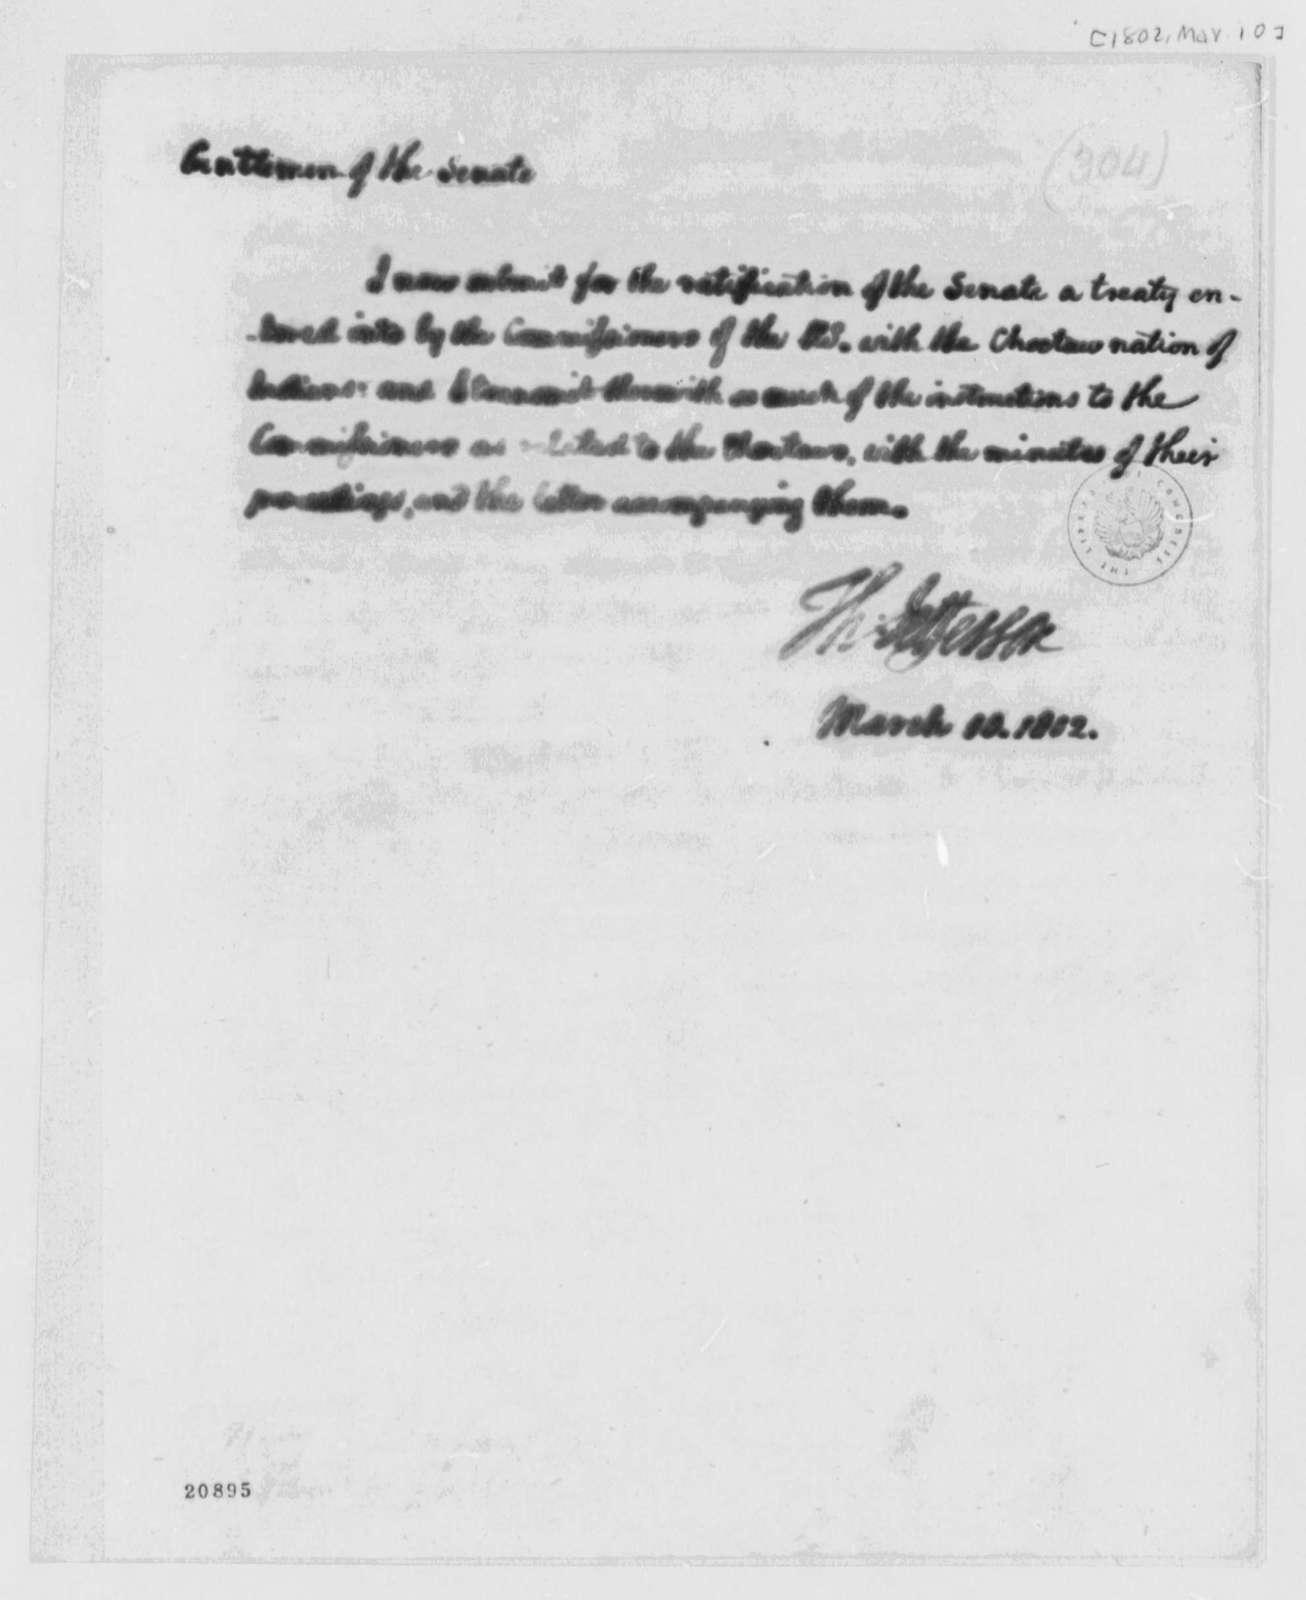 Thomas Jefferson to Senate, March 19, 1802